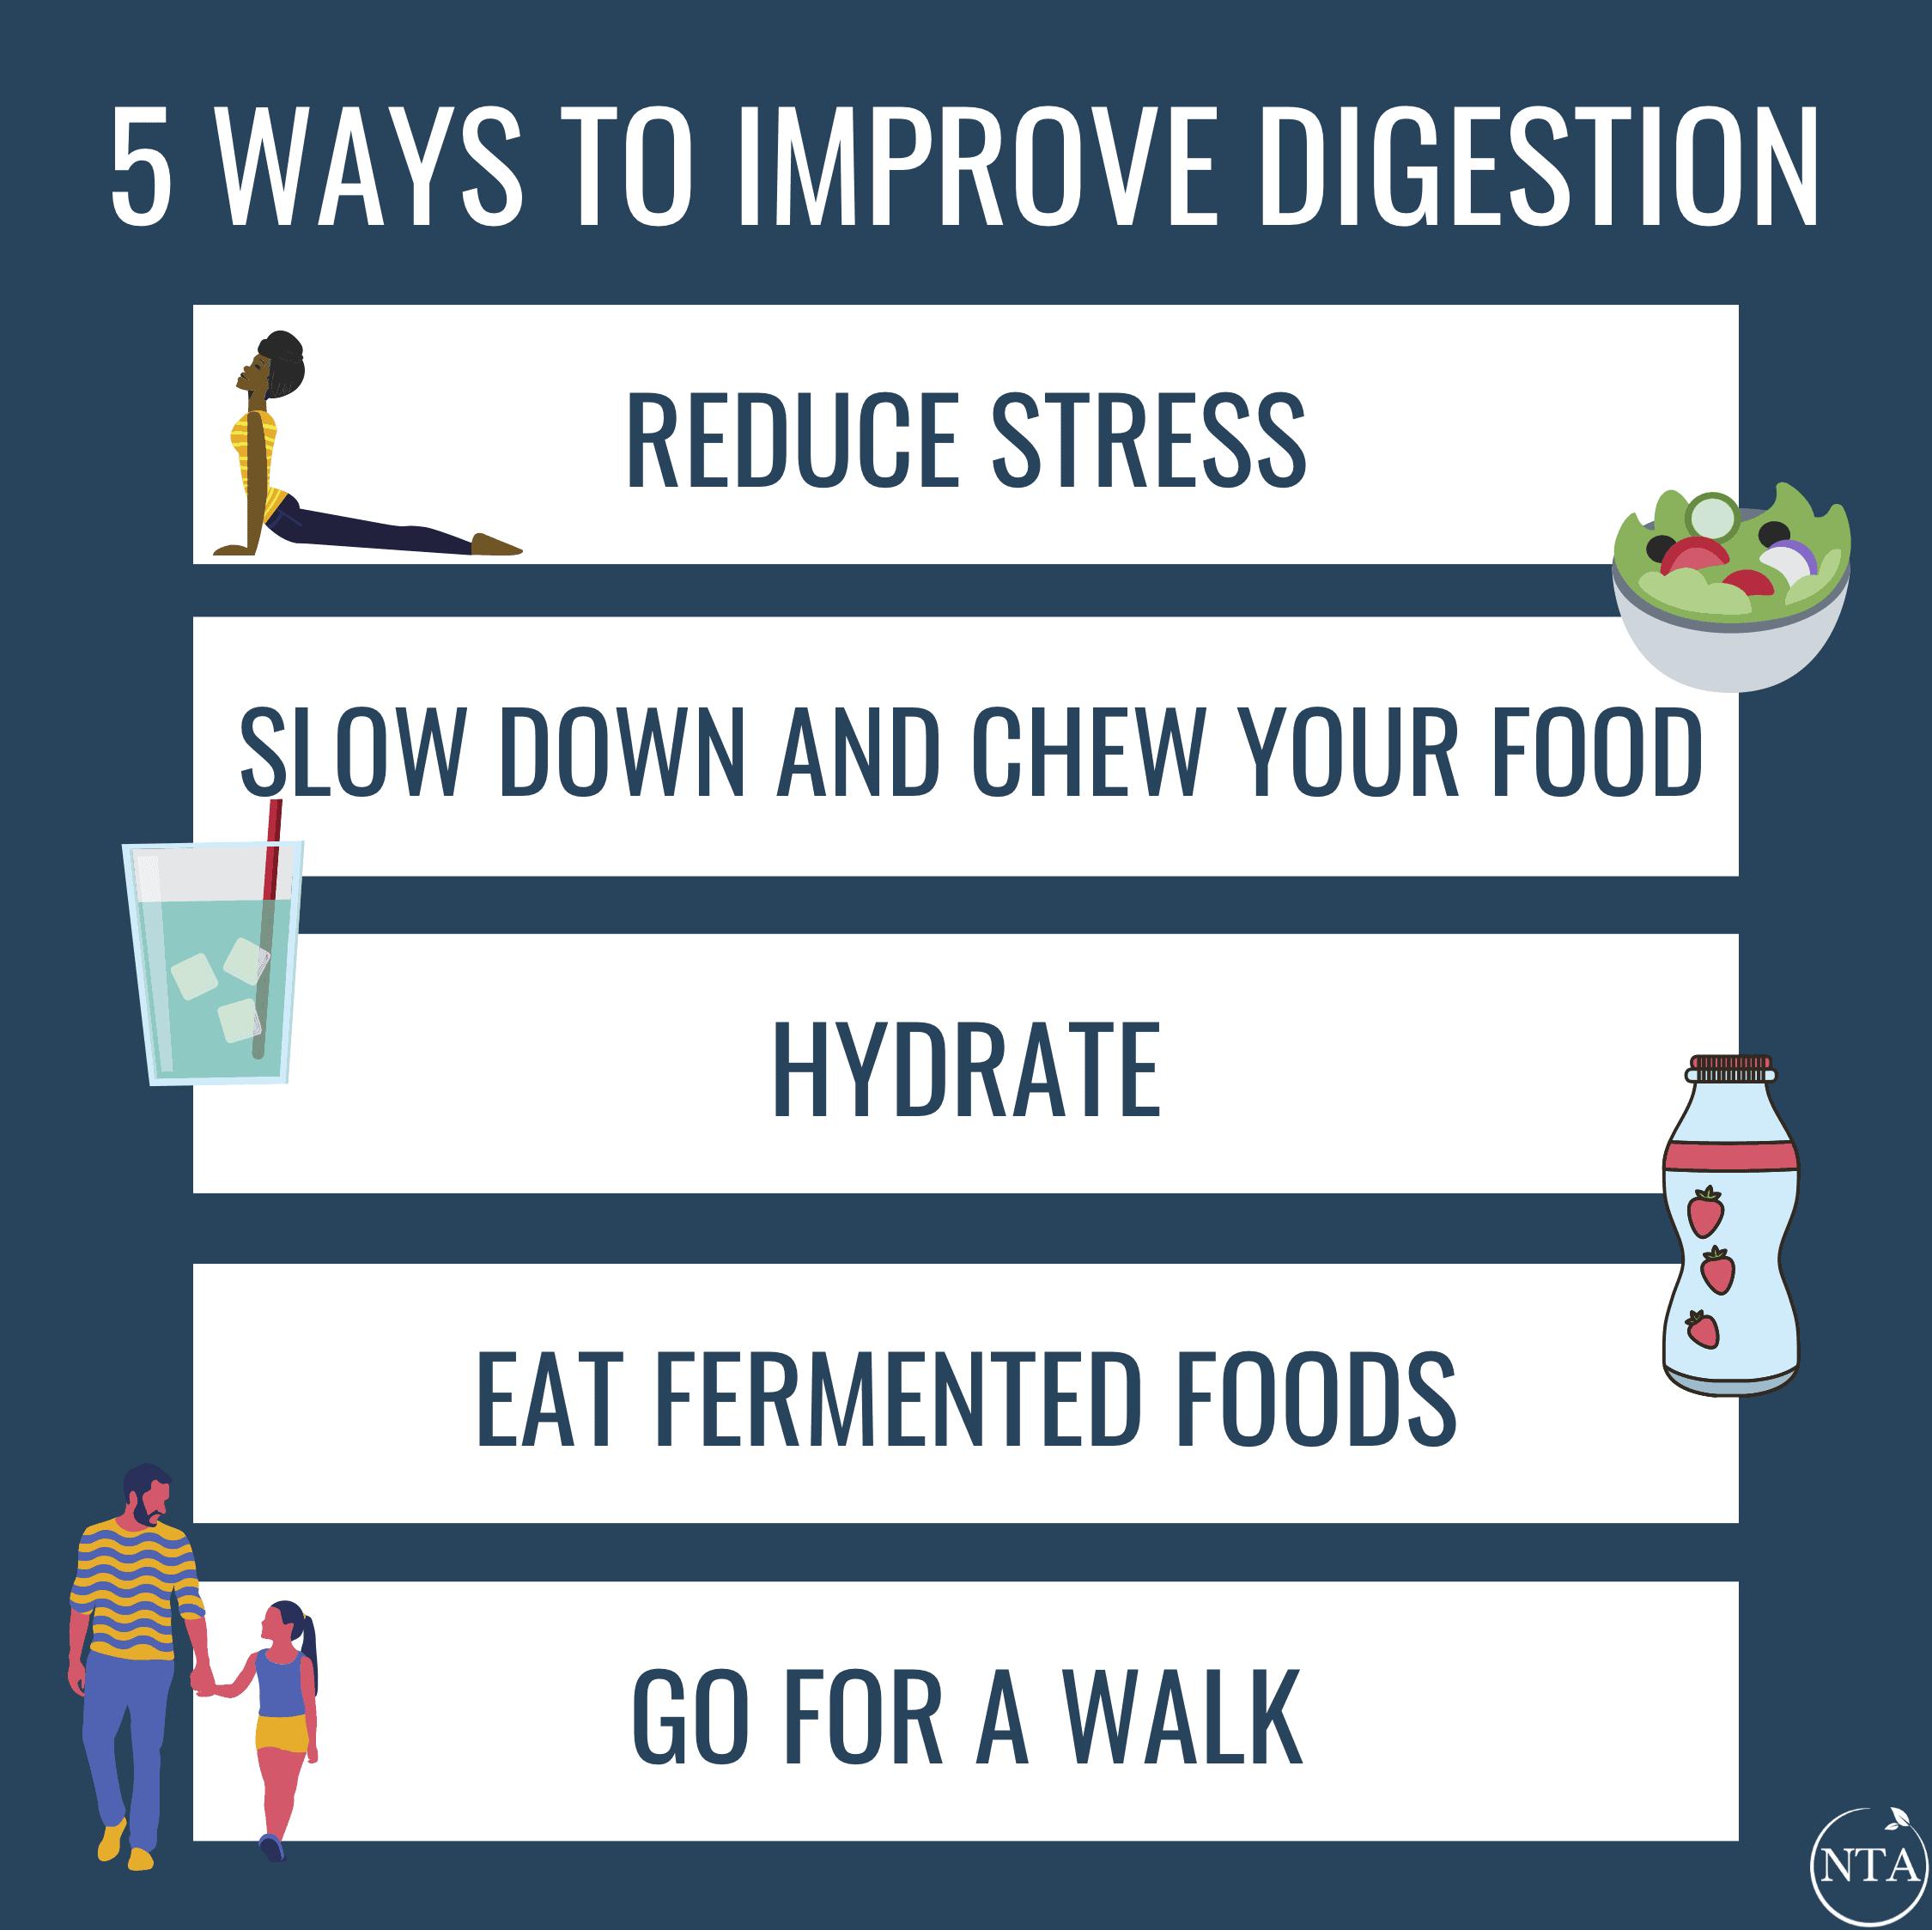 5 Ways To Improve Digestion